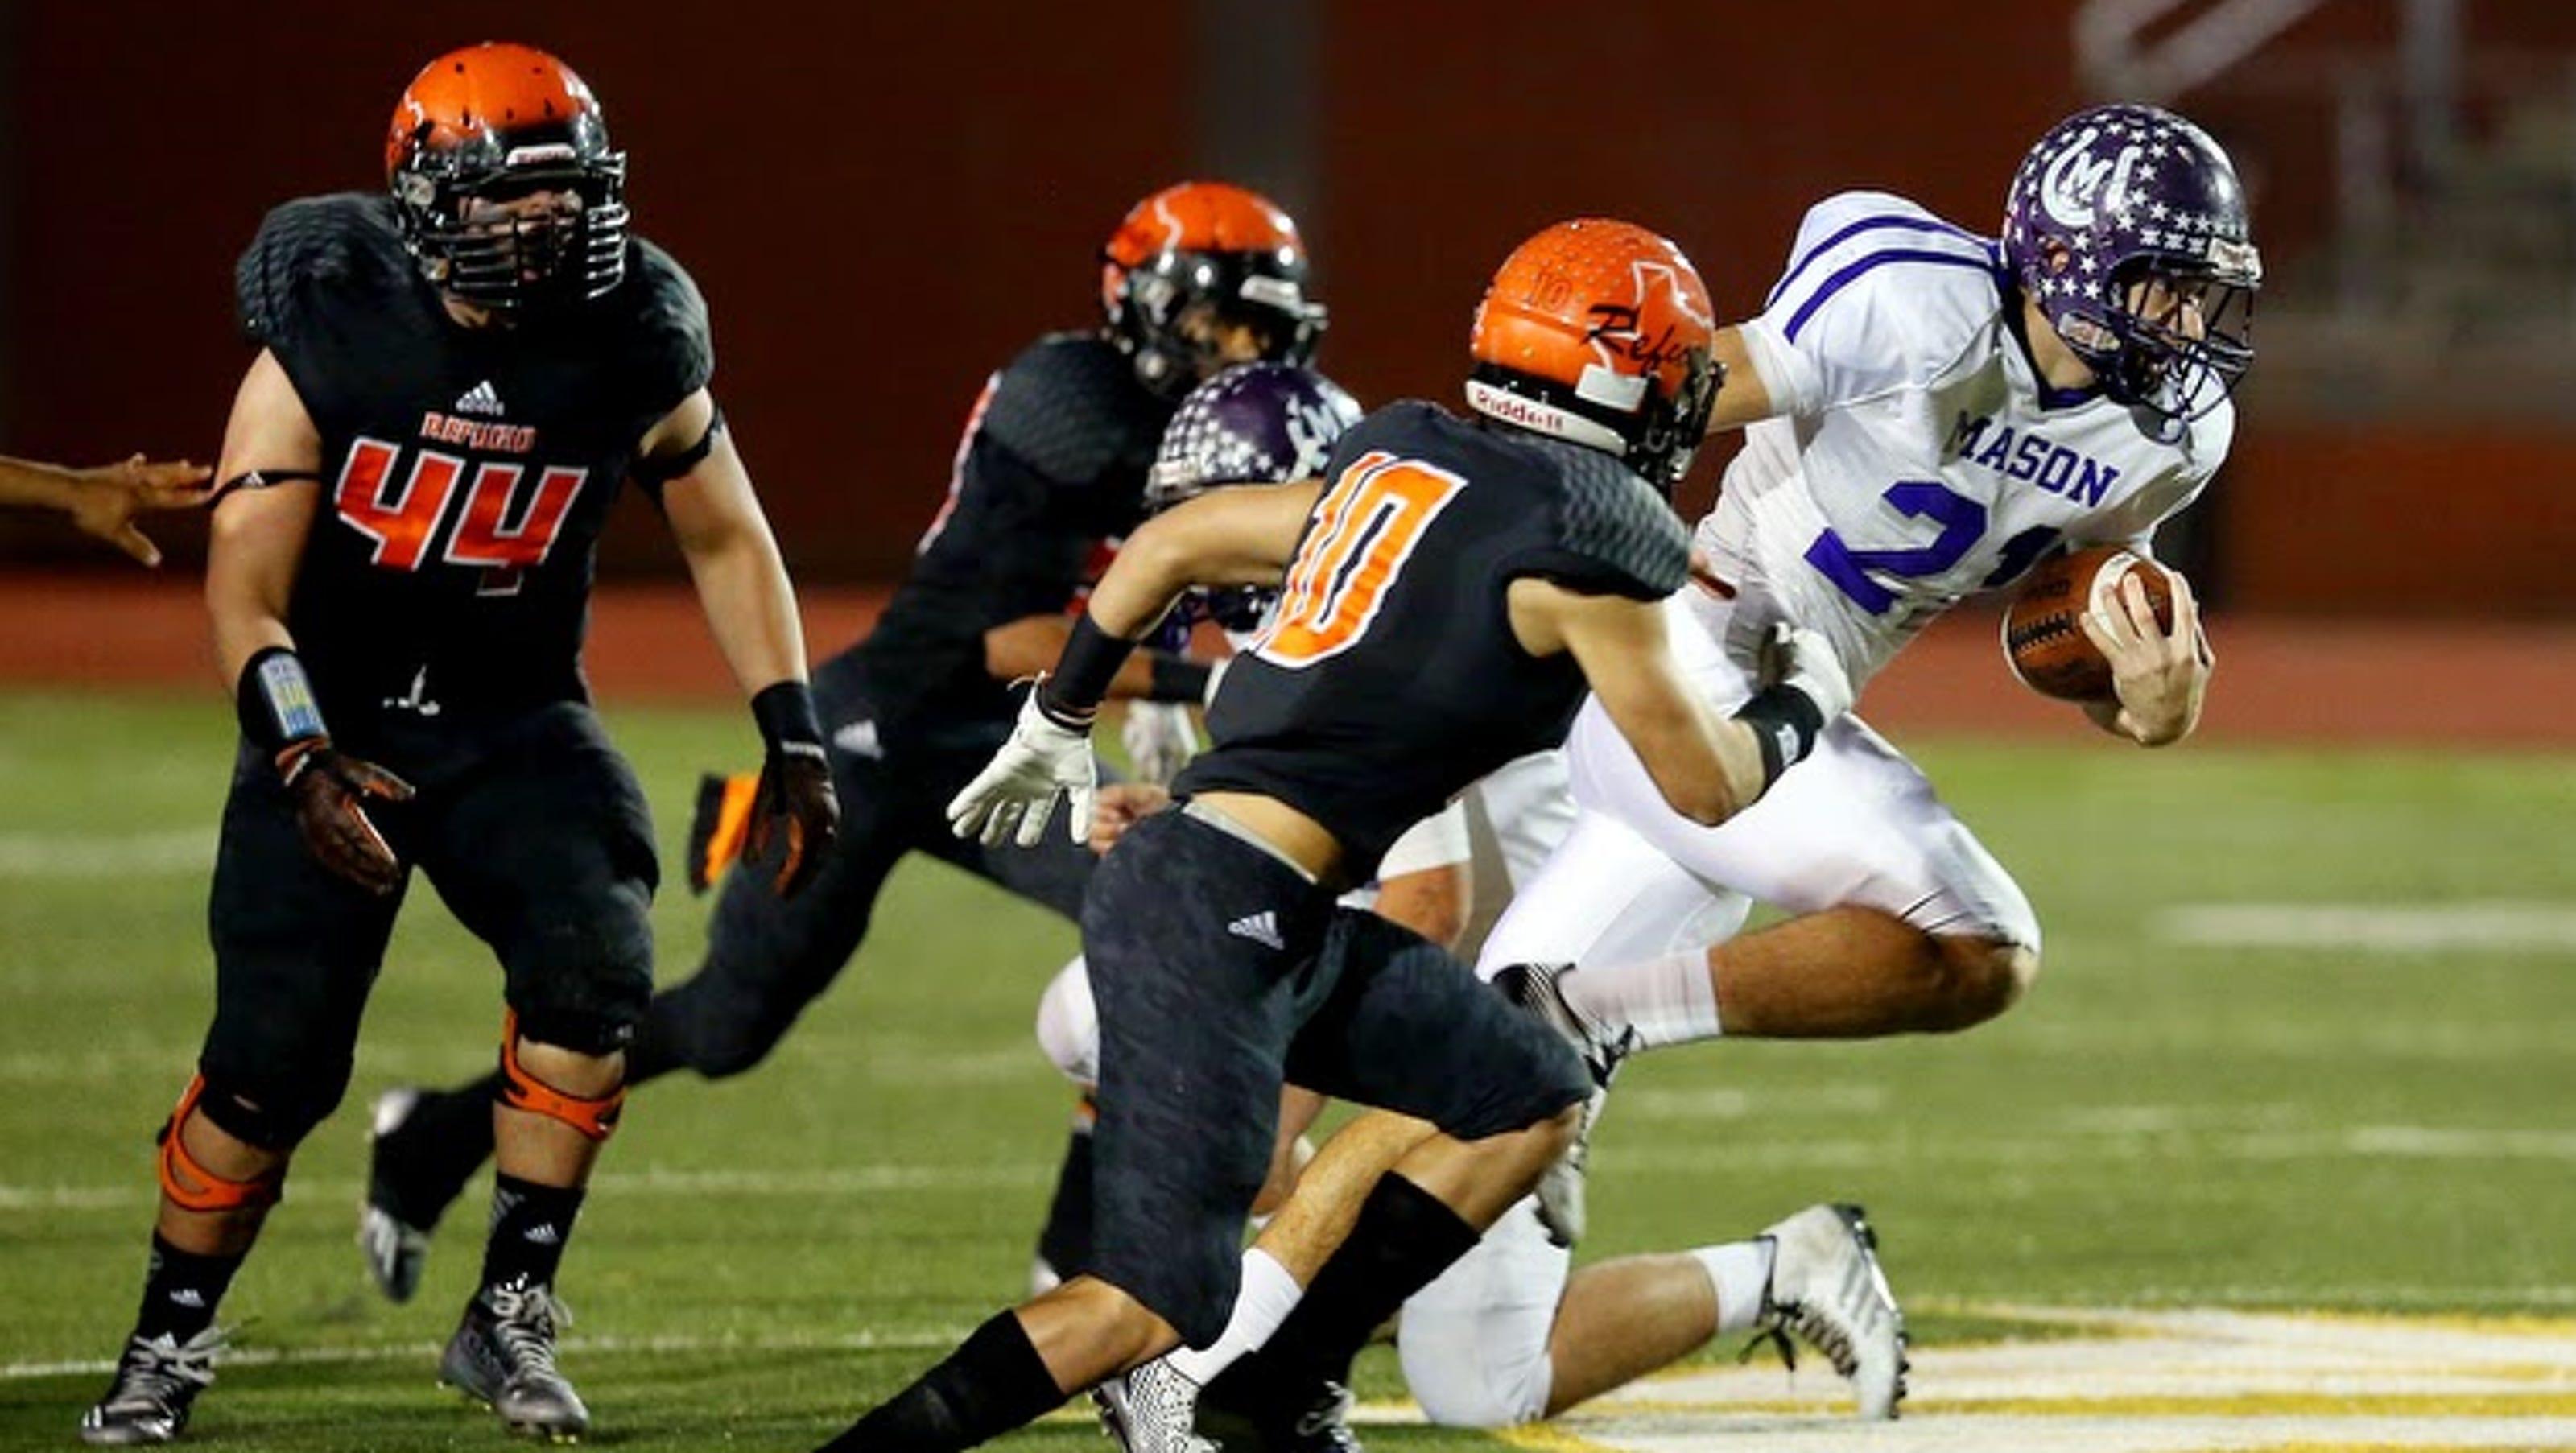 Mason Refugio Football Teams Weren T Rivals After Hurricane Harvey